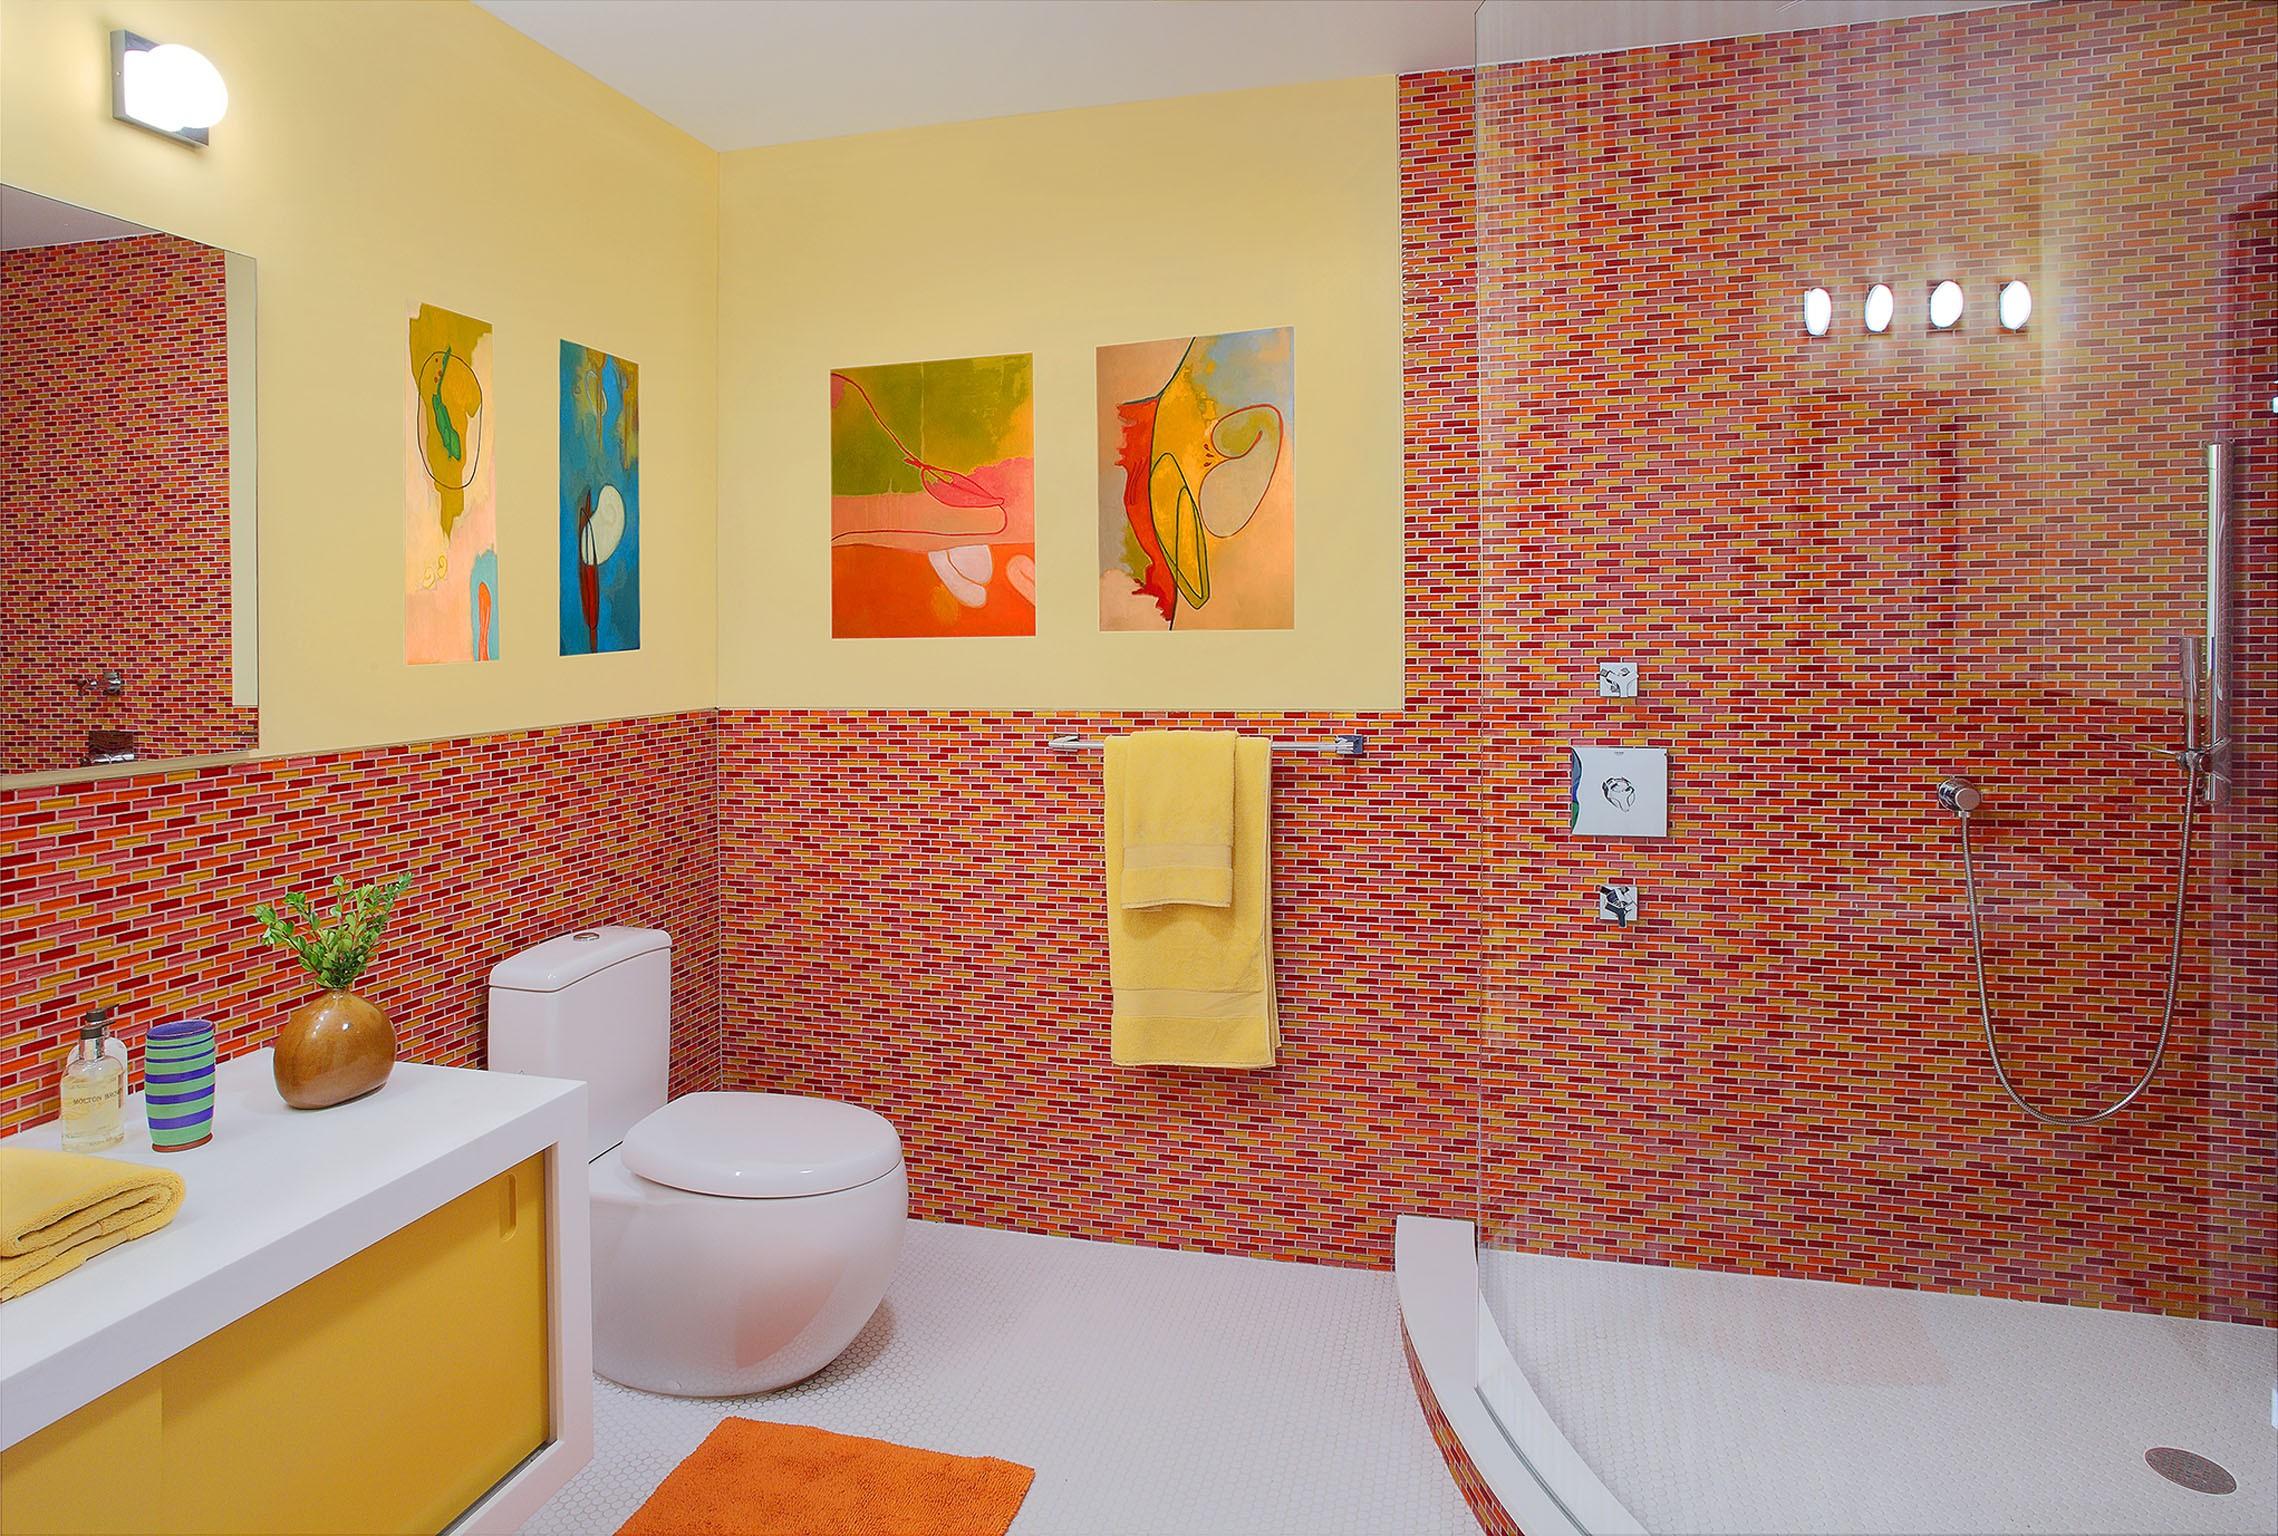 yellow and red bathroom 2015 06 25 1435255519 4120187 eisnerdesignllc jpg download